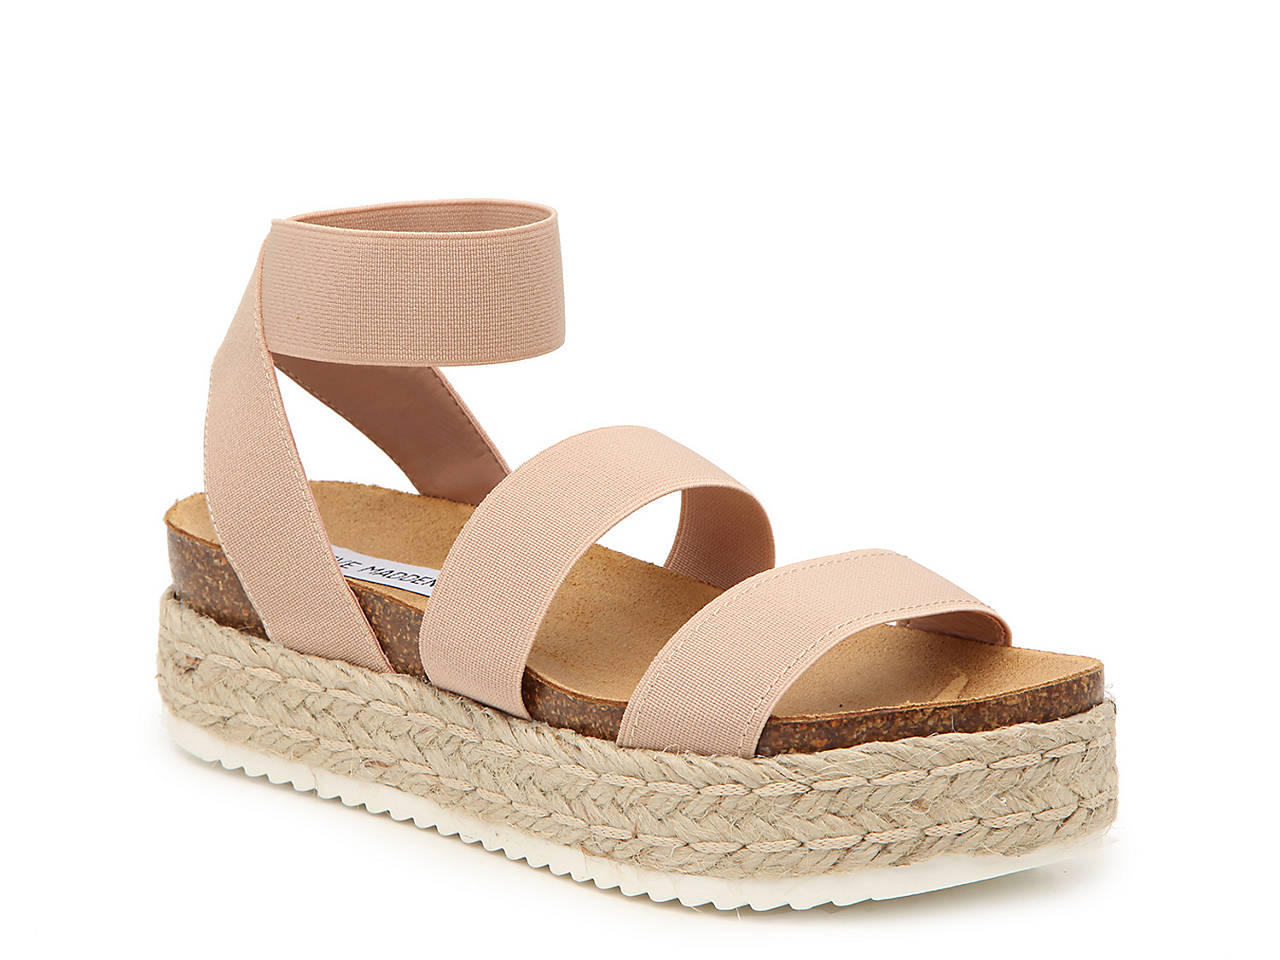 018d6cc0350 Kimmie Espadrille Wedge Sandal